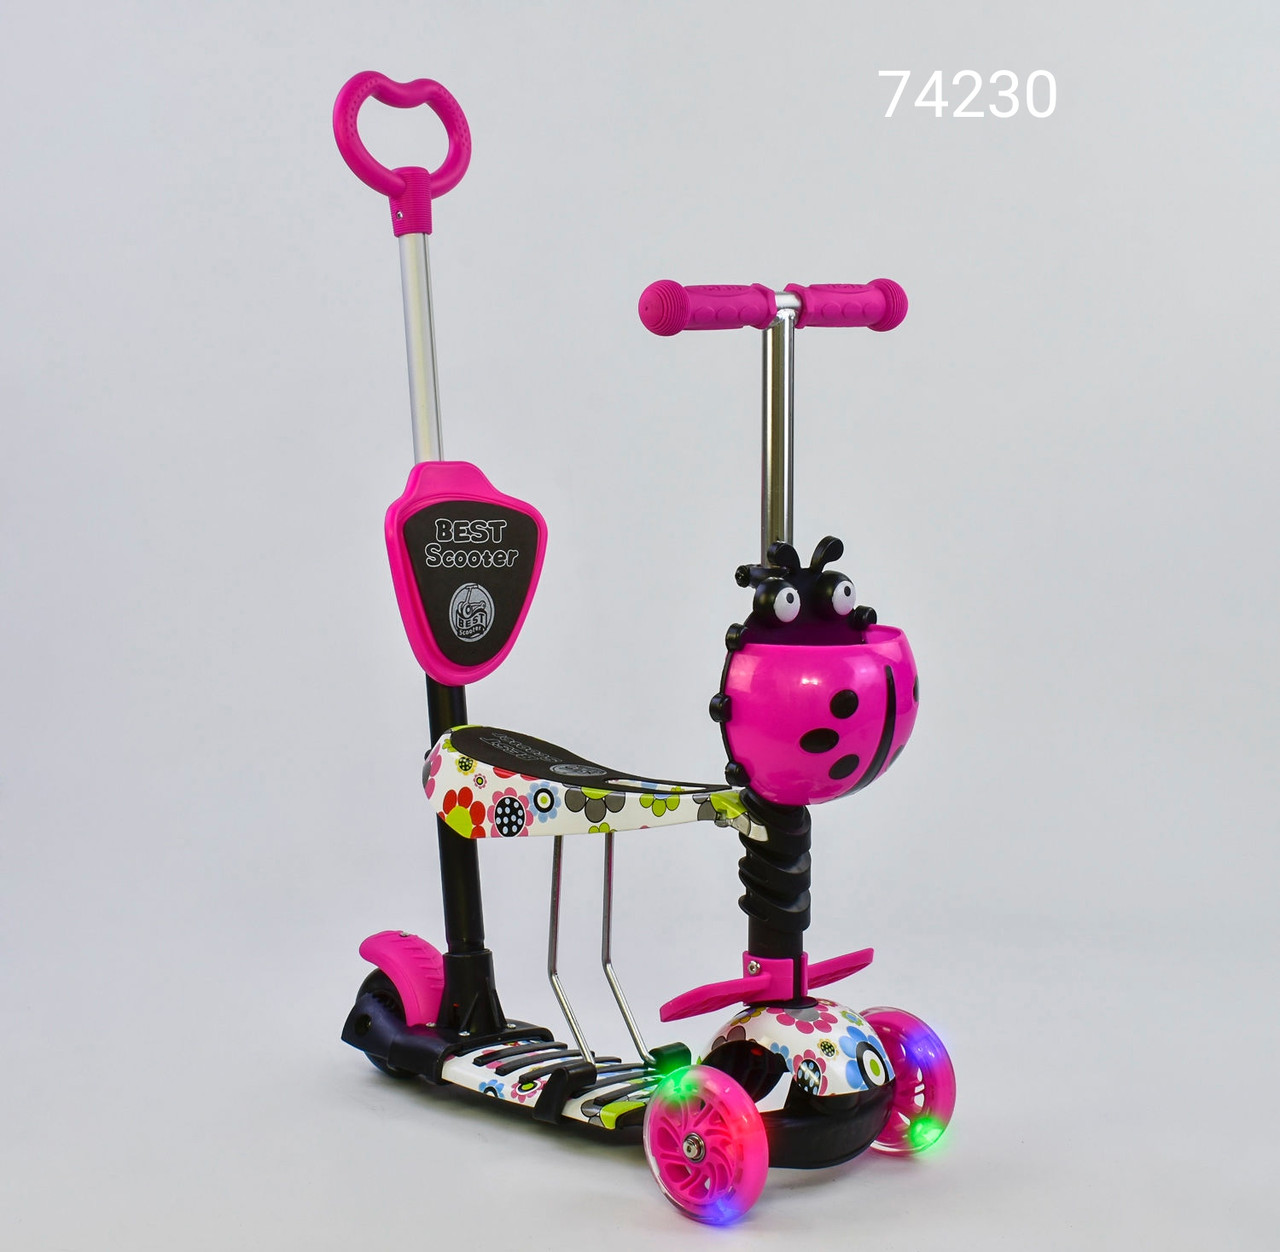 Детский самокат Best Scooter 5в1 74230